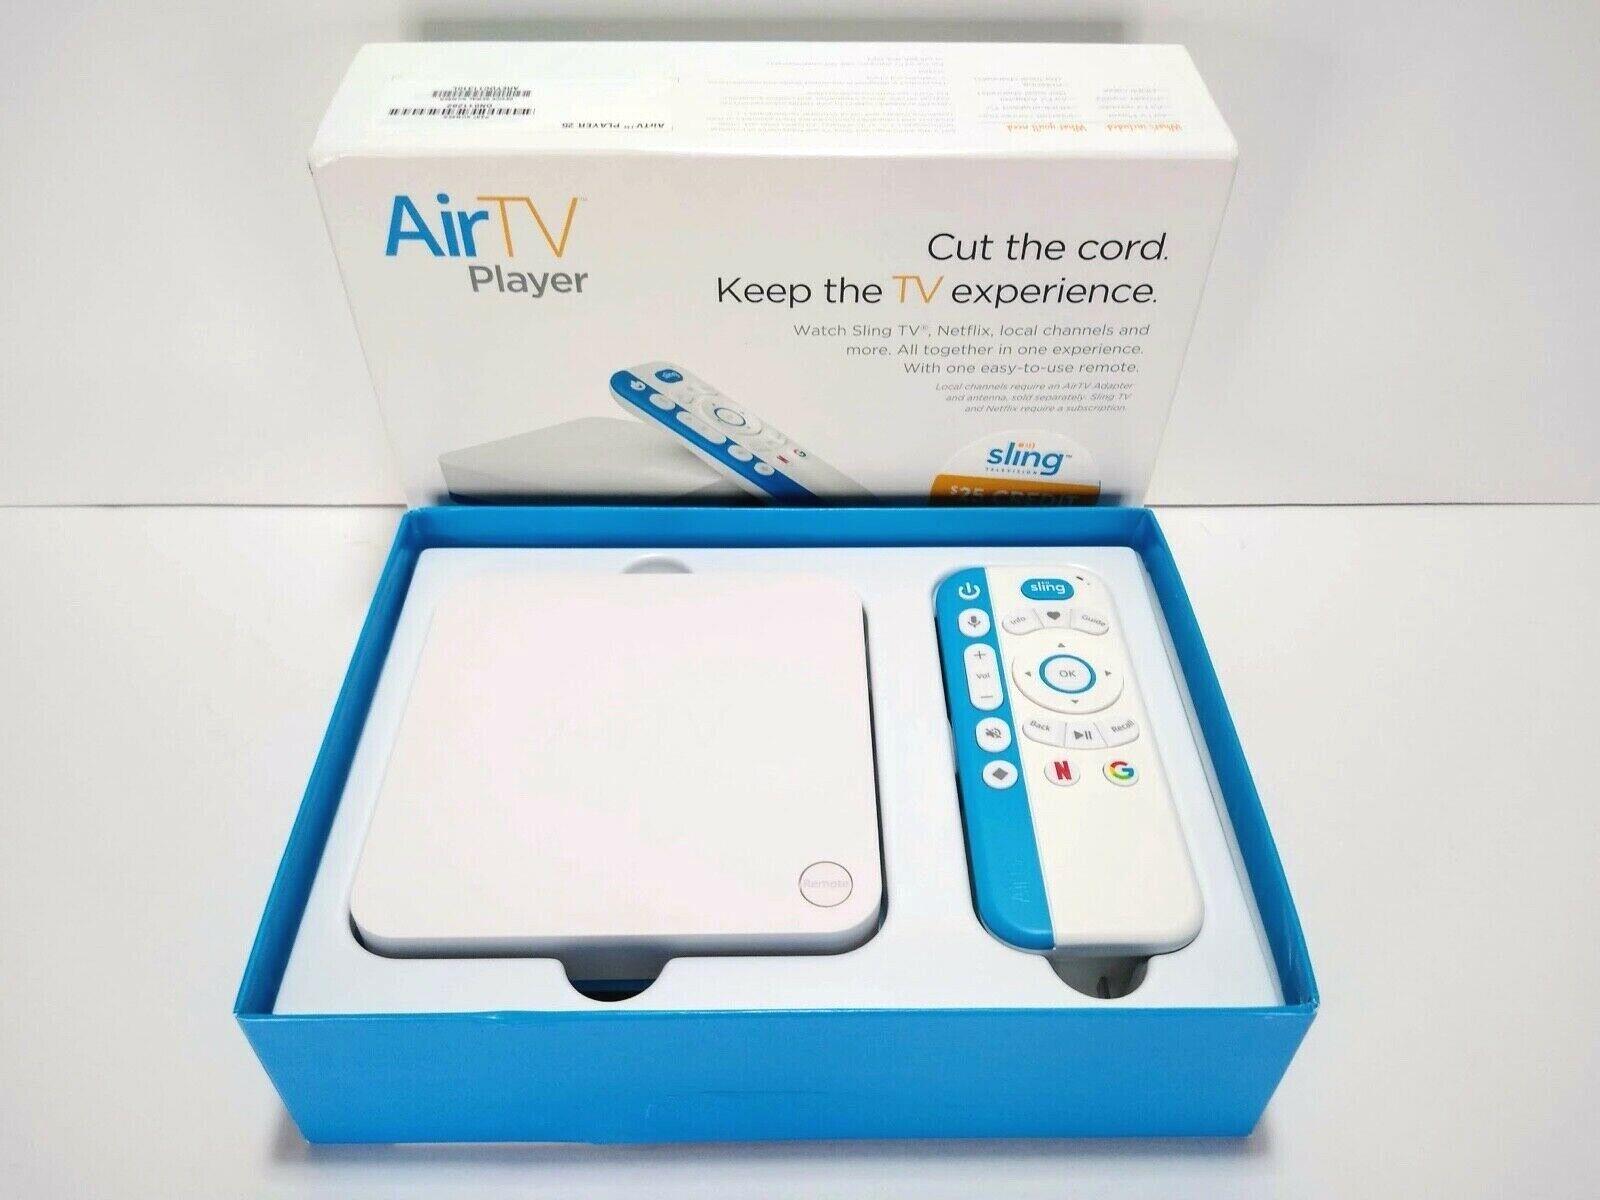 AirTV UIW4010ECH 8 GB 4K Streaming Media Player - White / Blue - New Open Box airtv blue box media new open player streaming uiw4010ech white